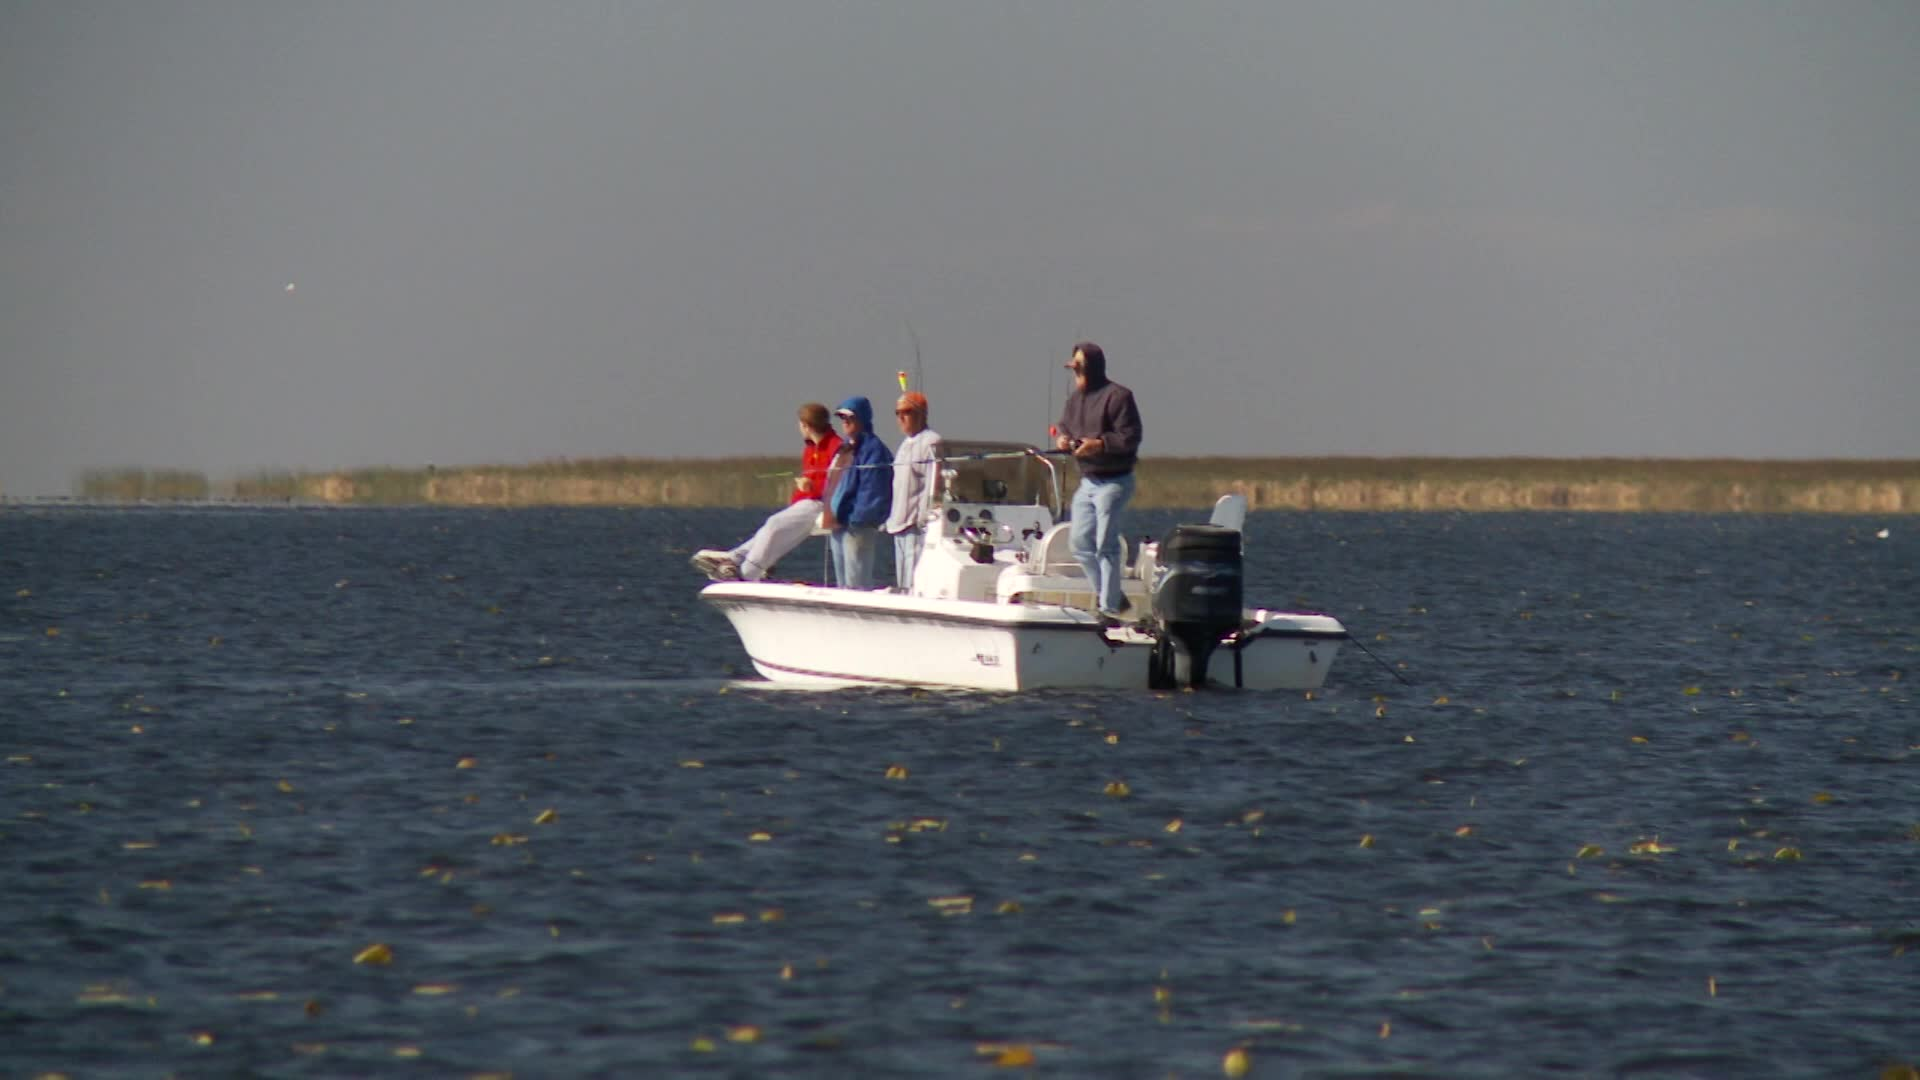 Lake Okeechobee - Reel in the Outdoors